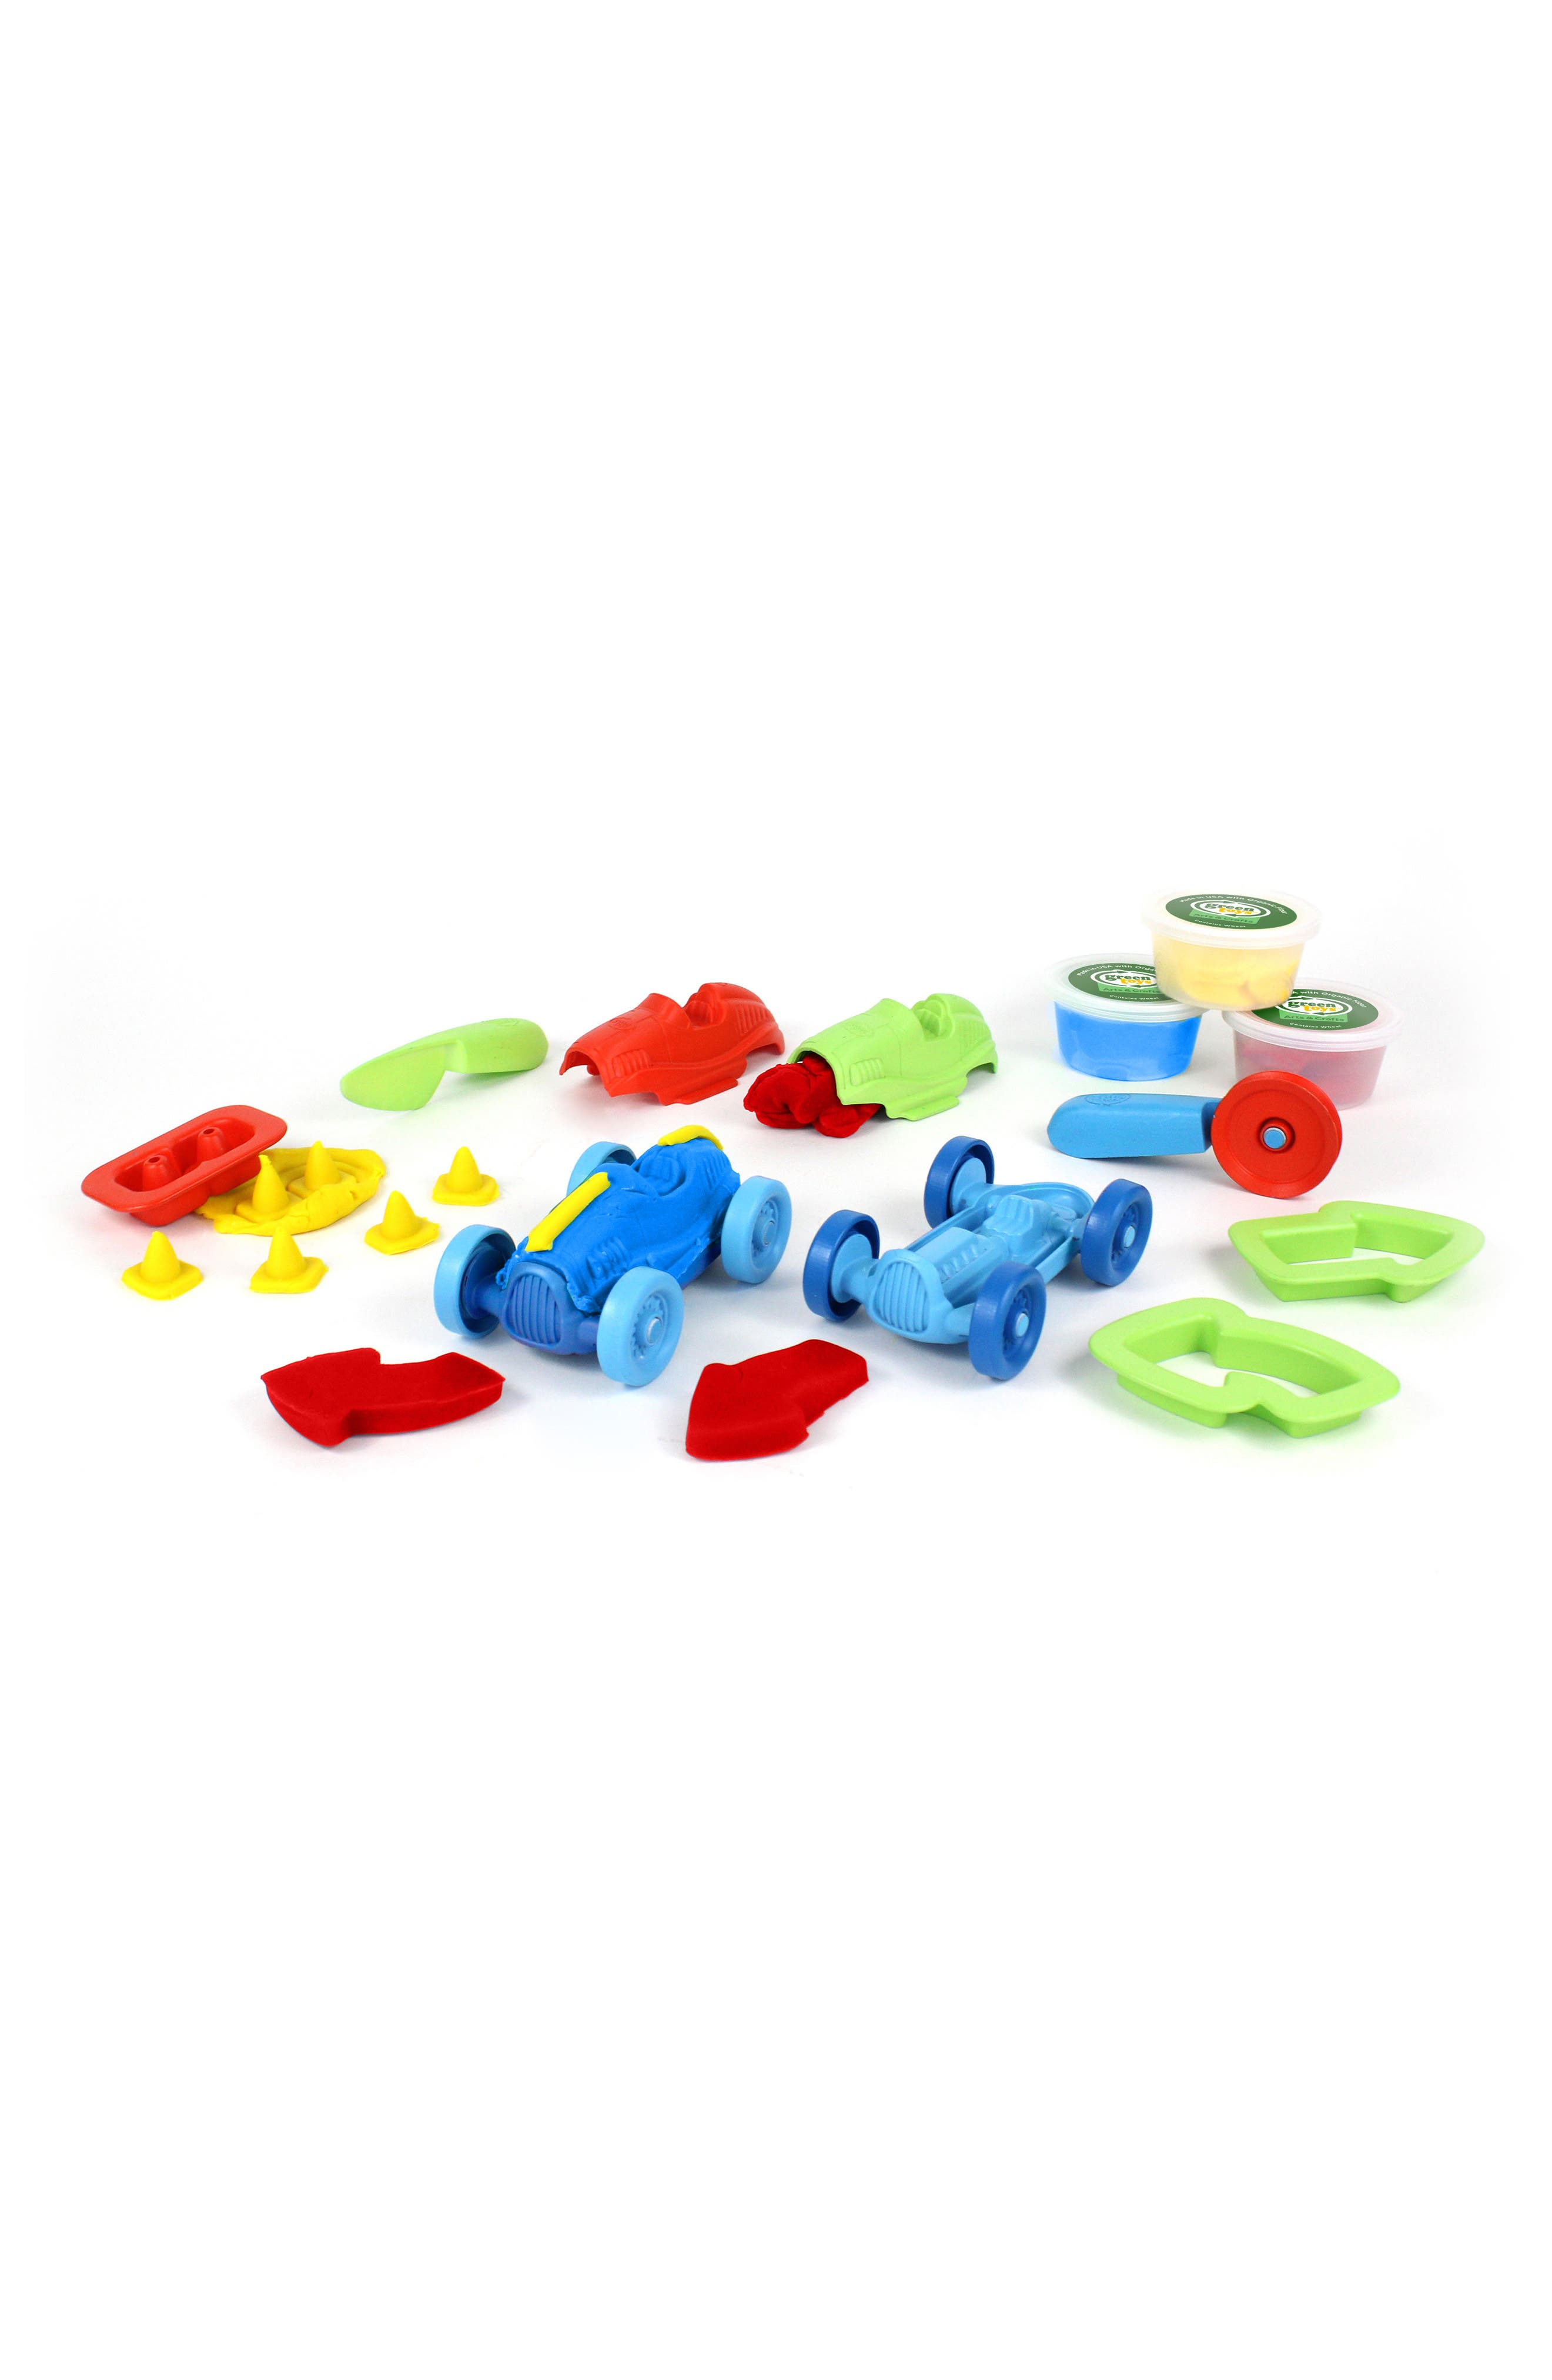 Toddler Boys Green Toys 12Piece Plastic Racecar Maker Dough Set